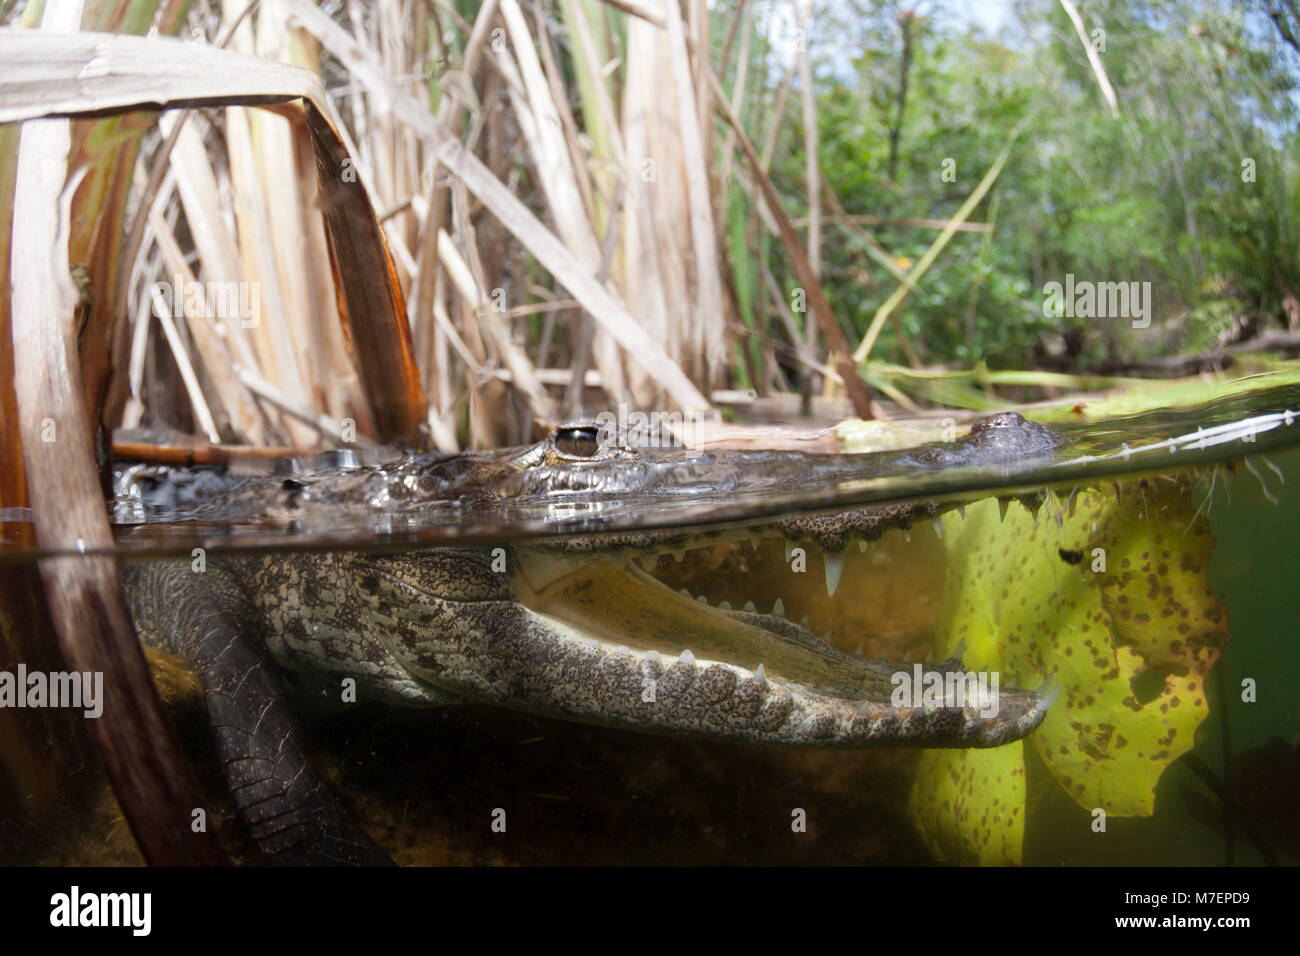 Morelets Crocodile, Crocodylus moreletii, Cancun, Yucatan, Mexico - Stock Image